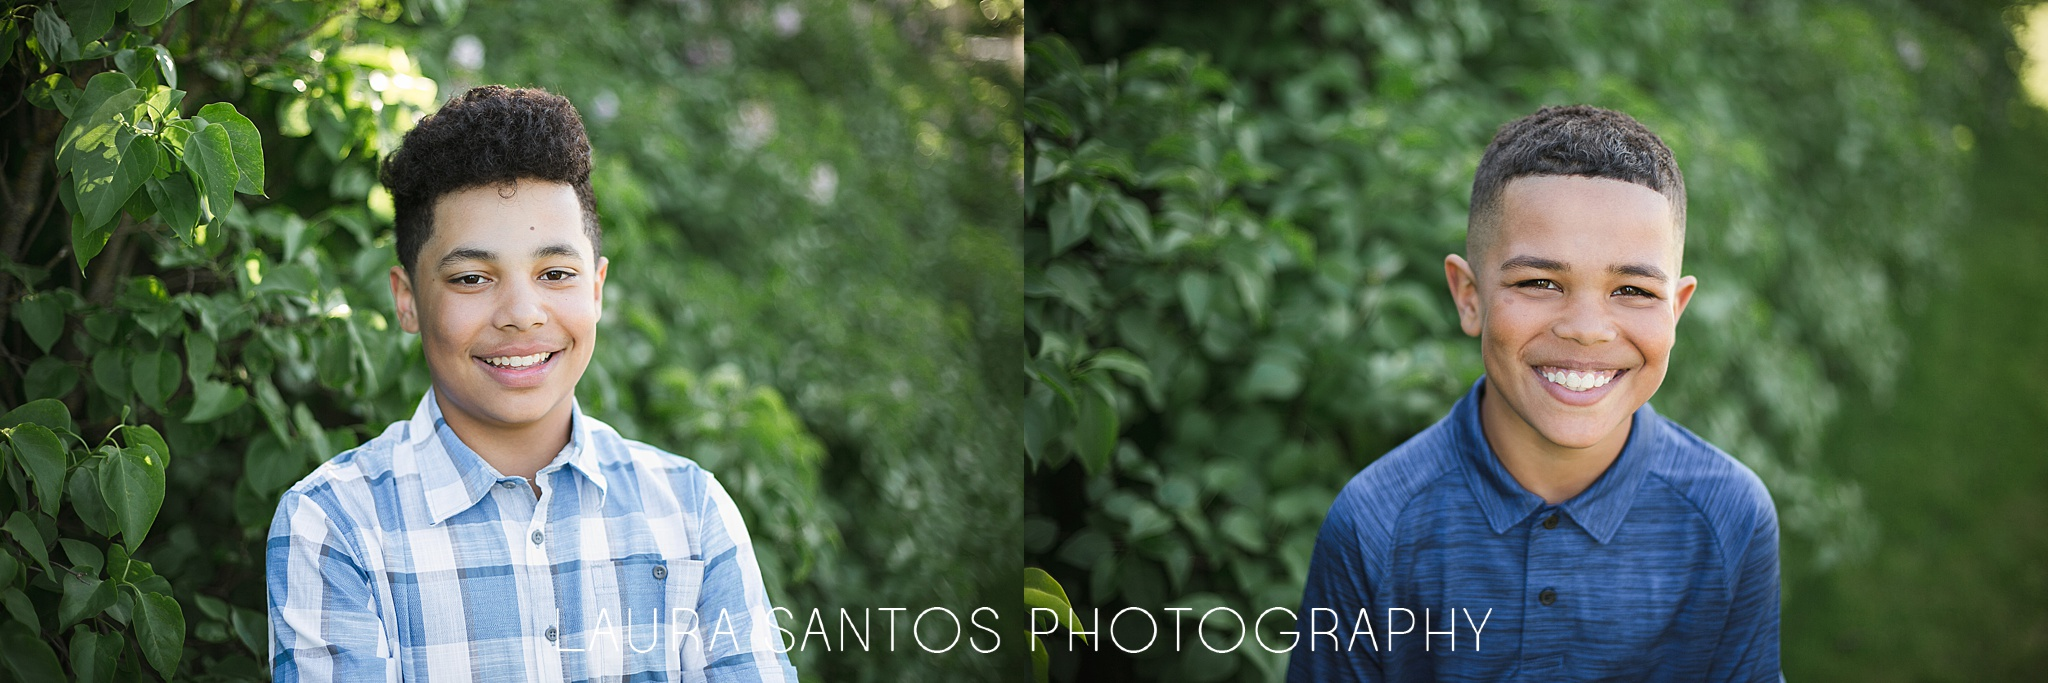 Laura Santos Photography Portland Oregon Family Photographer_0944.jpg